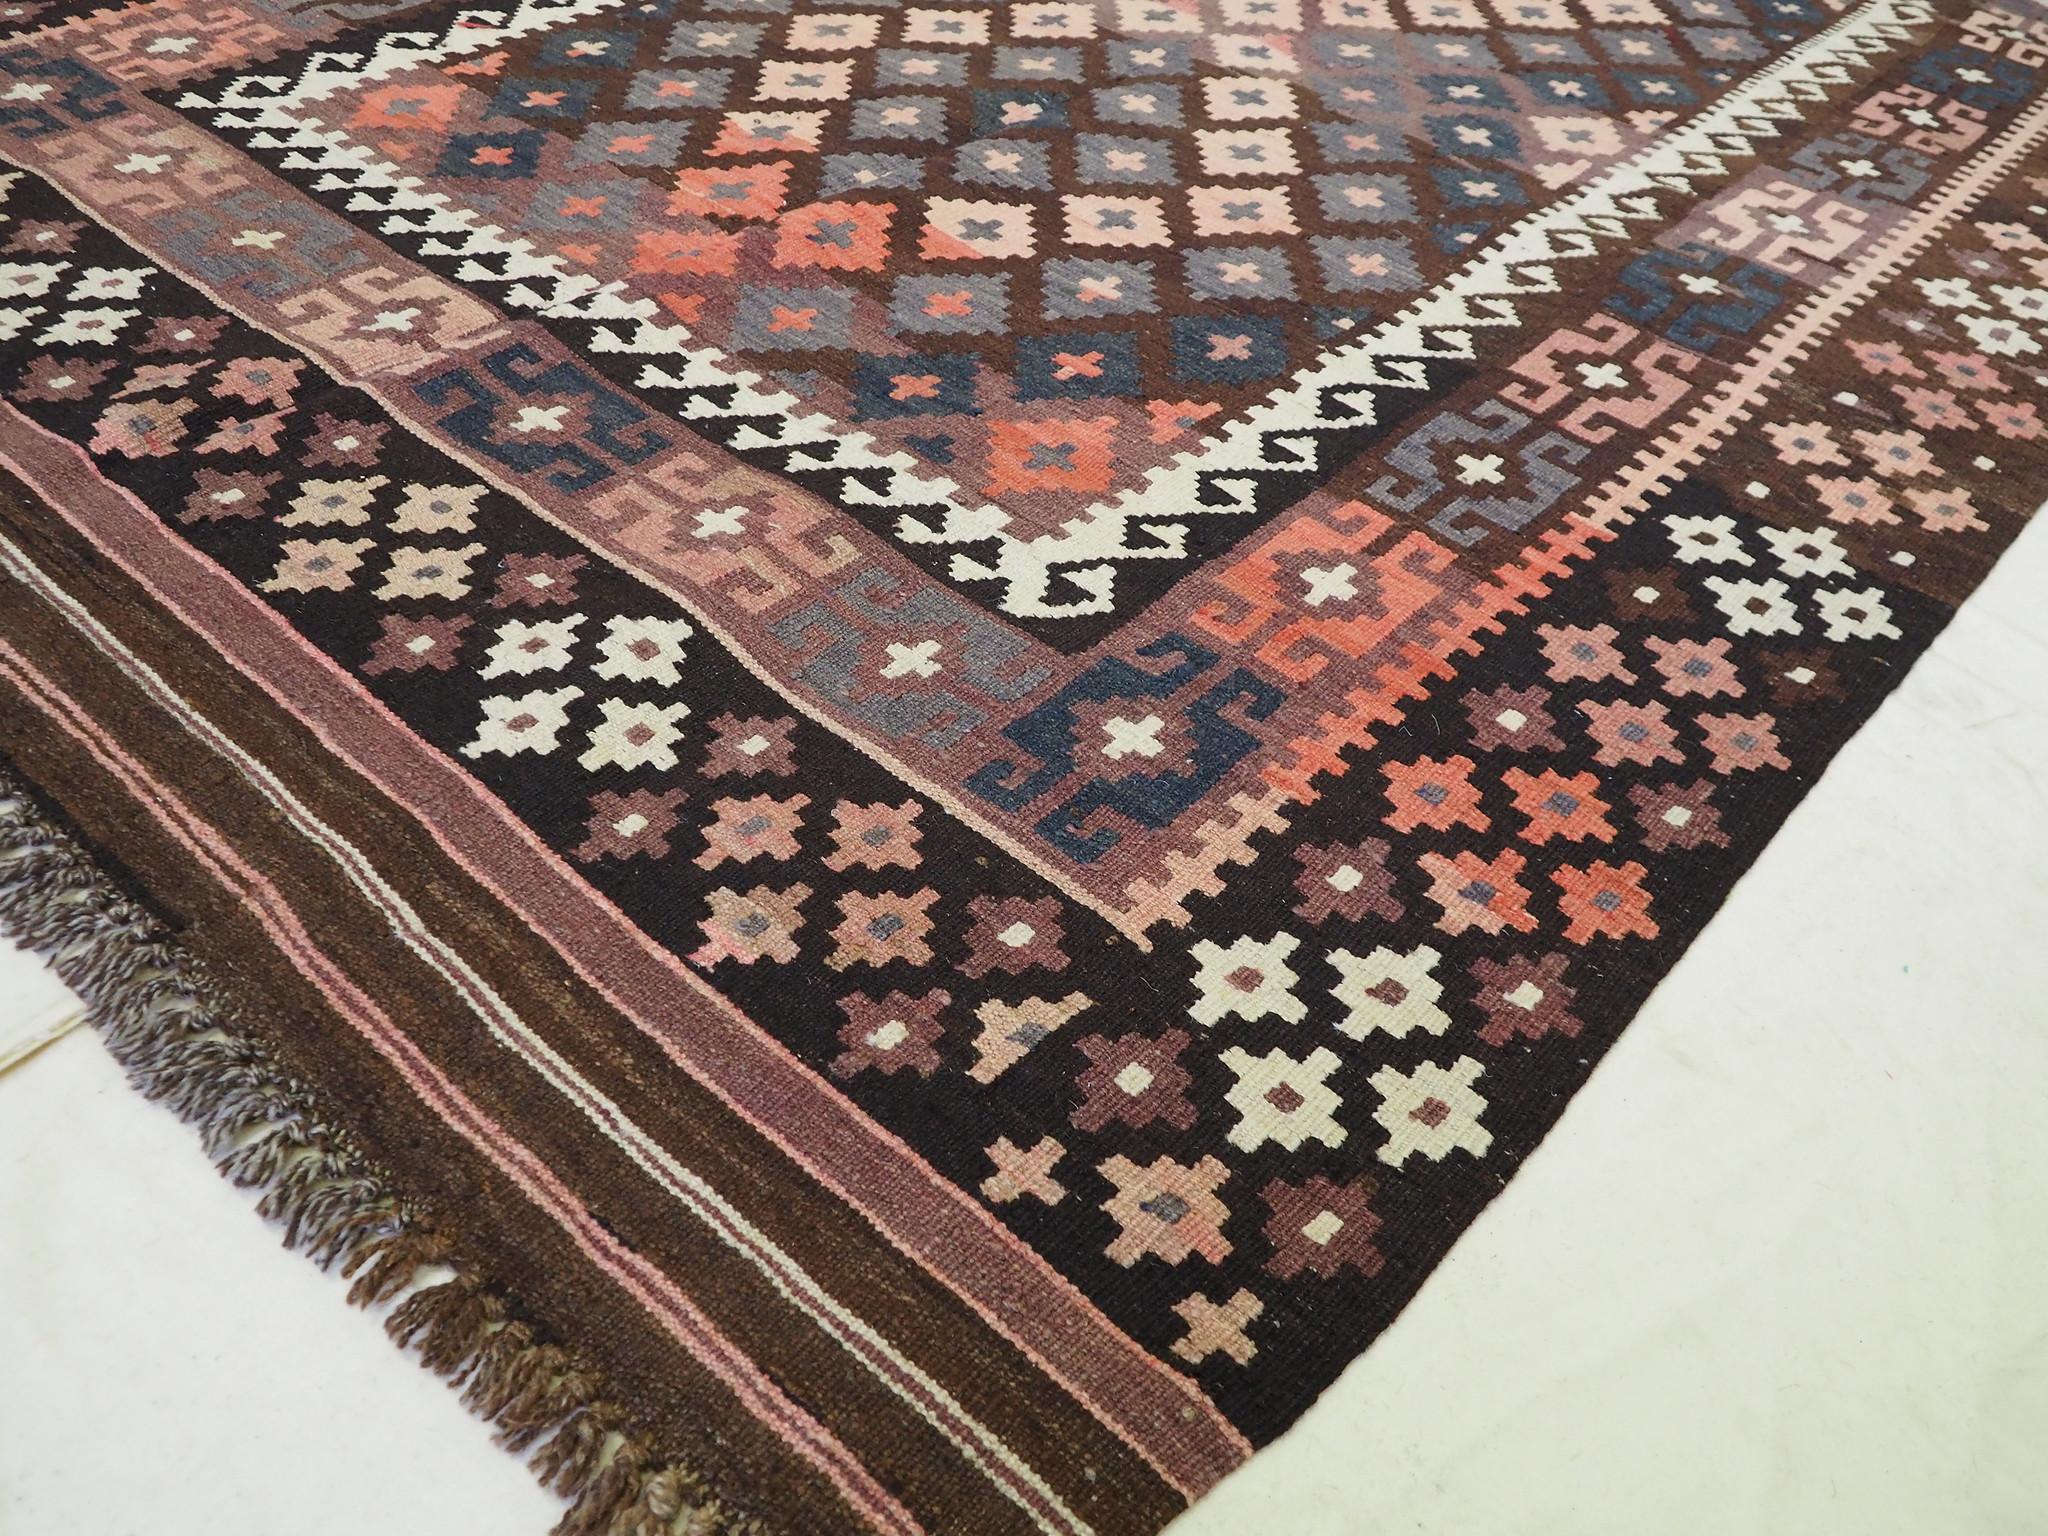 216x137 cm orient handgewebte Teppich Afghan Uzbek Nomaden Planzenfarbe kelim Nord Afghanistan No:271